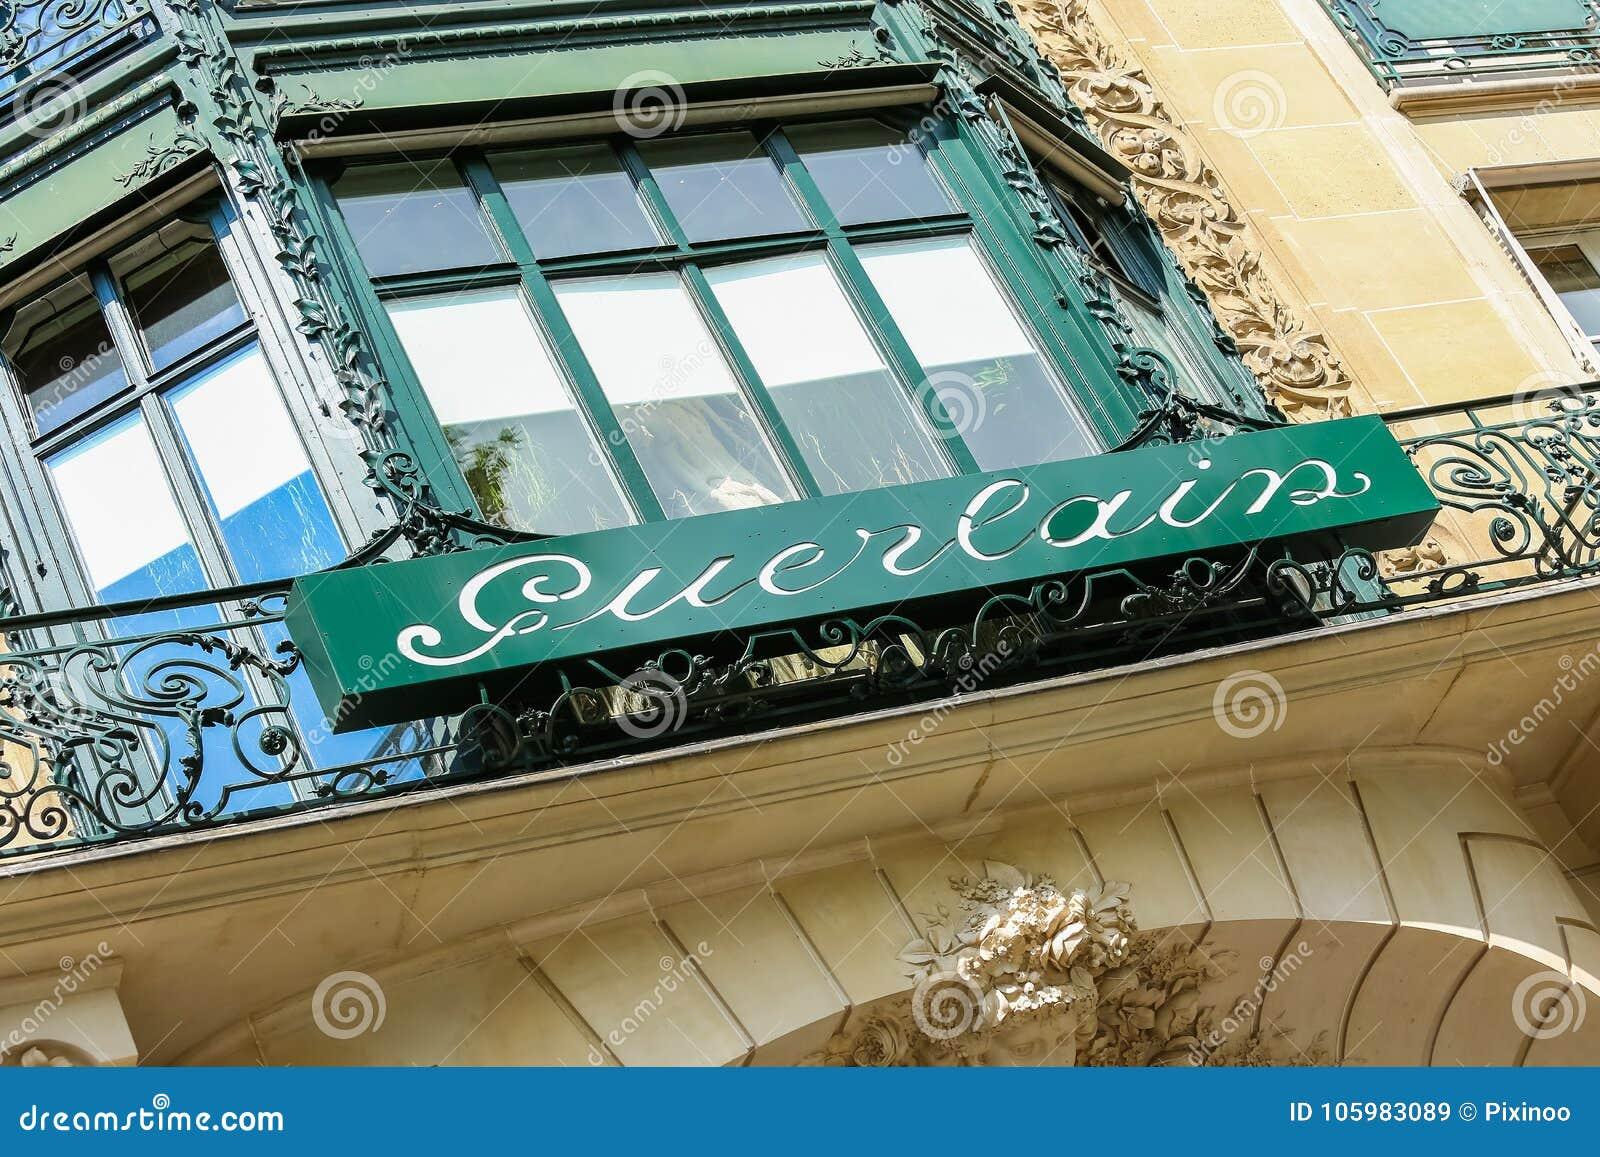 Paris, France - July 14, 2014: Guerlain storefront on the Champs Elysees.